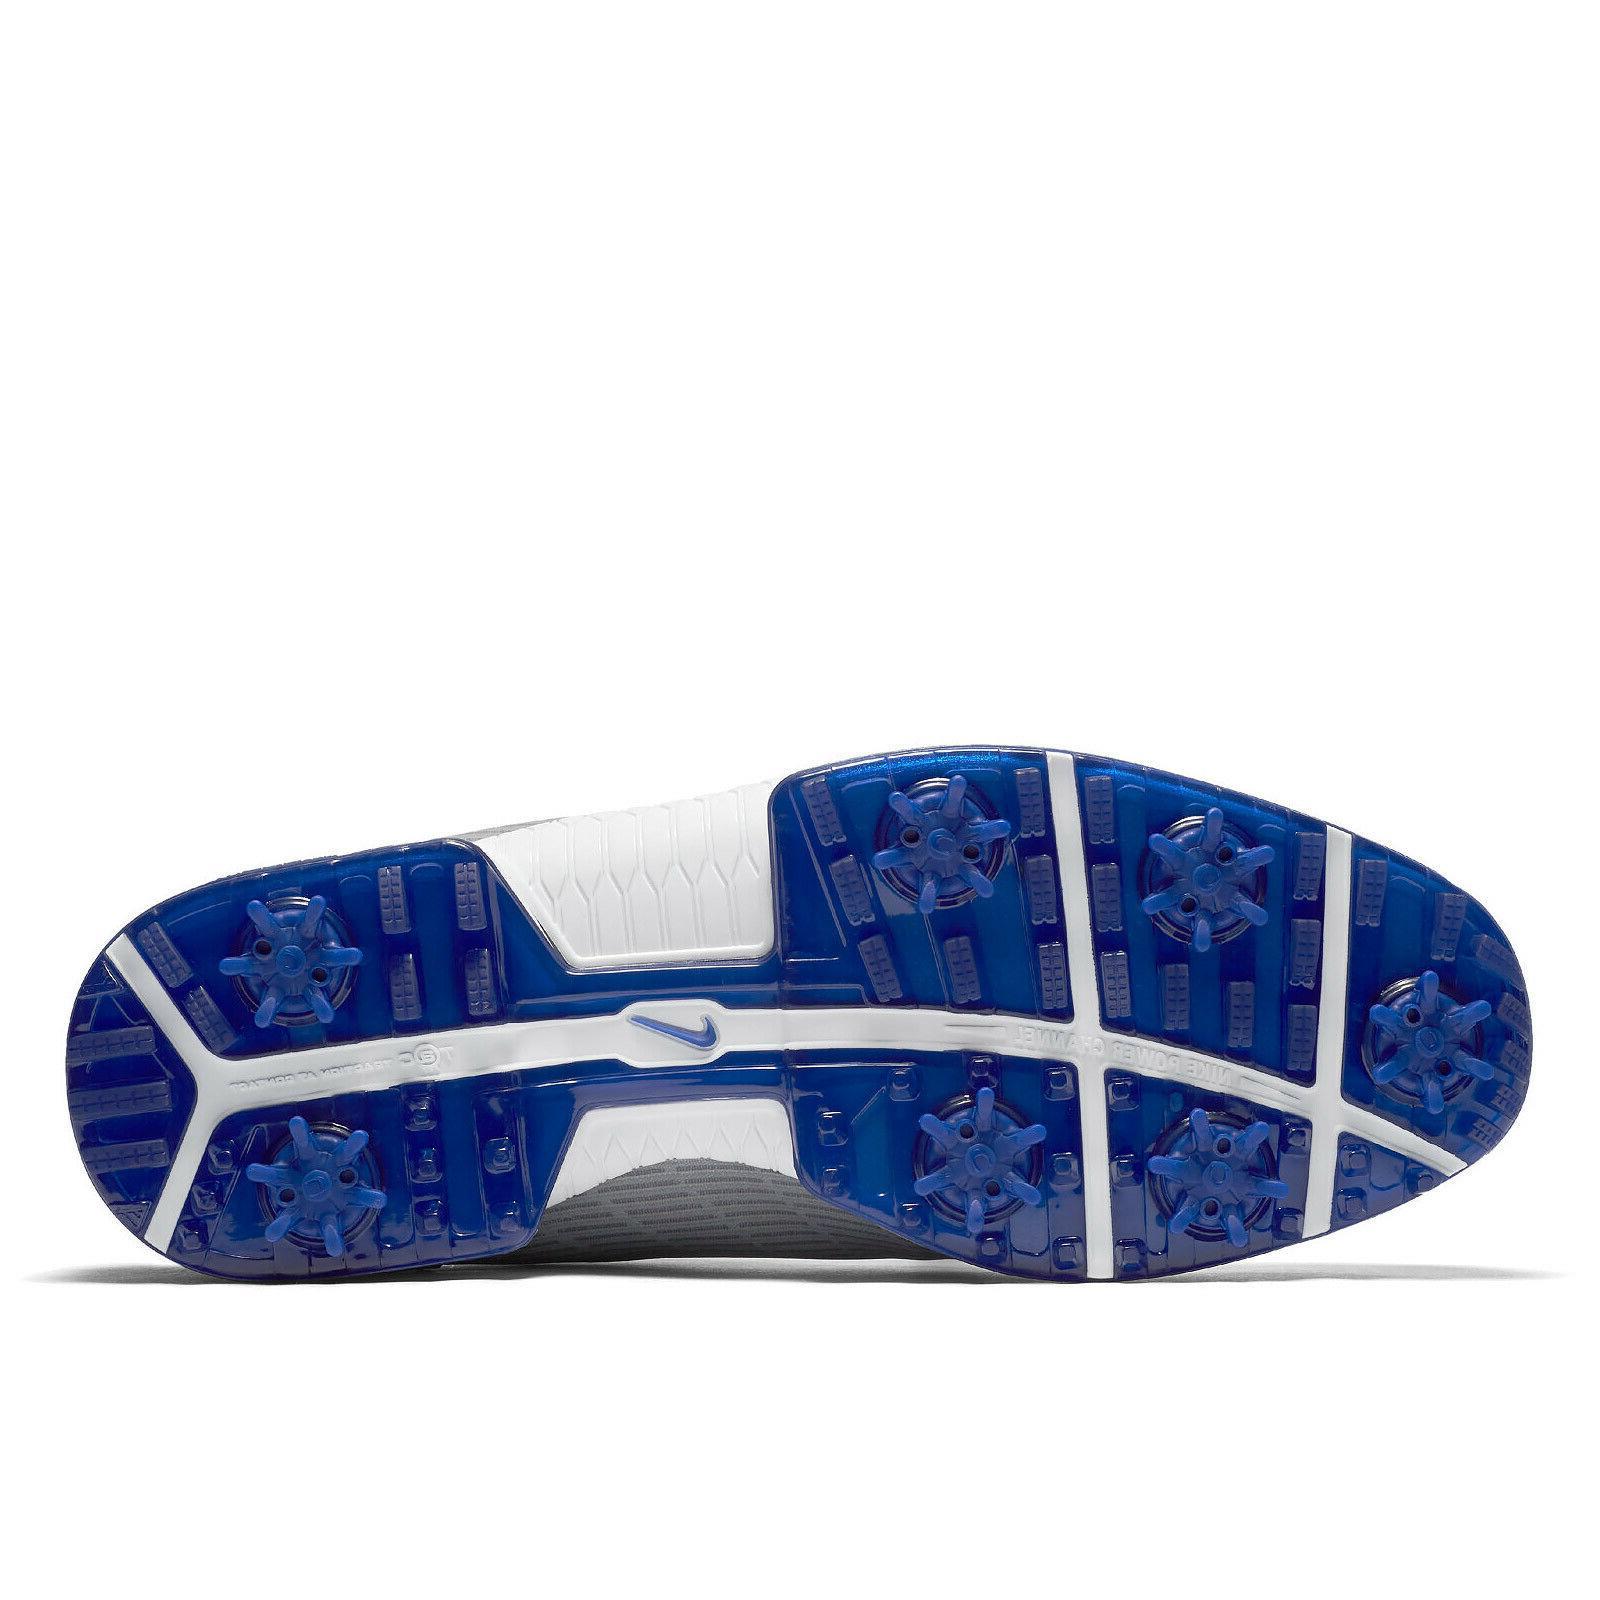 Nike Mens Golf Cleats Blue -